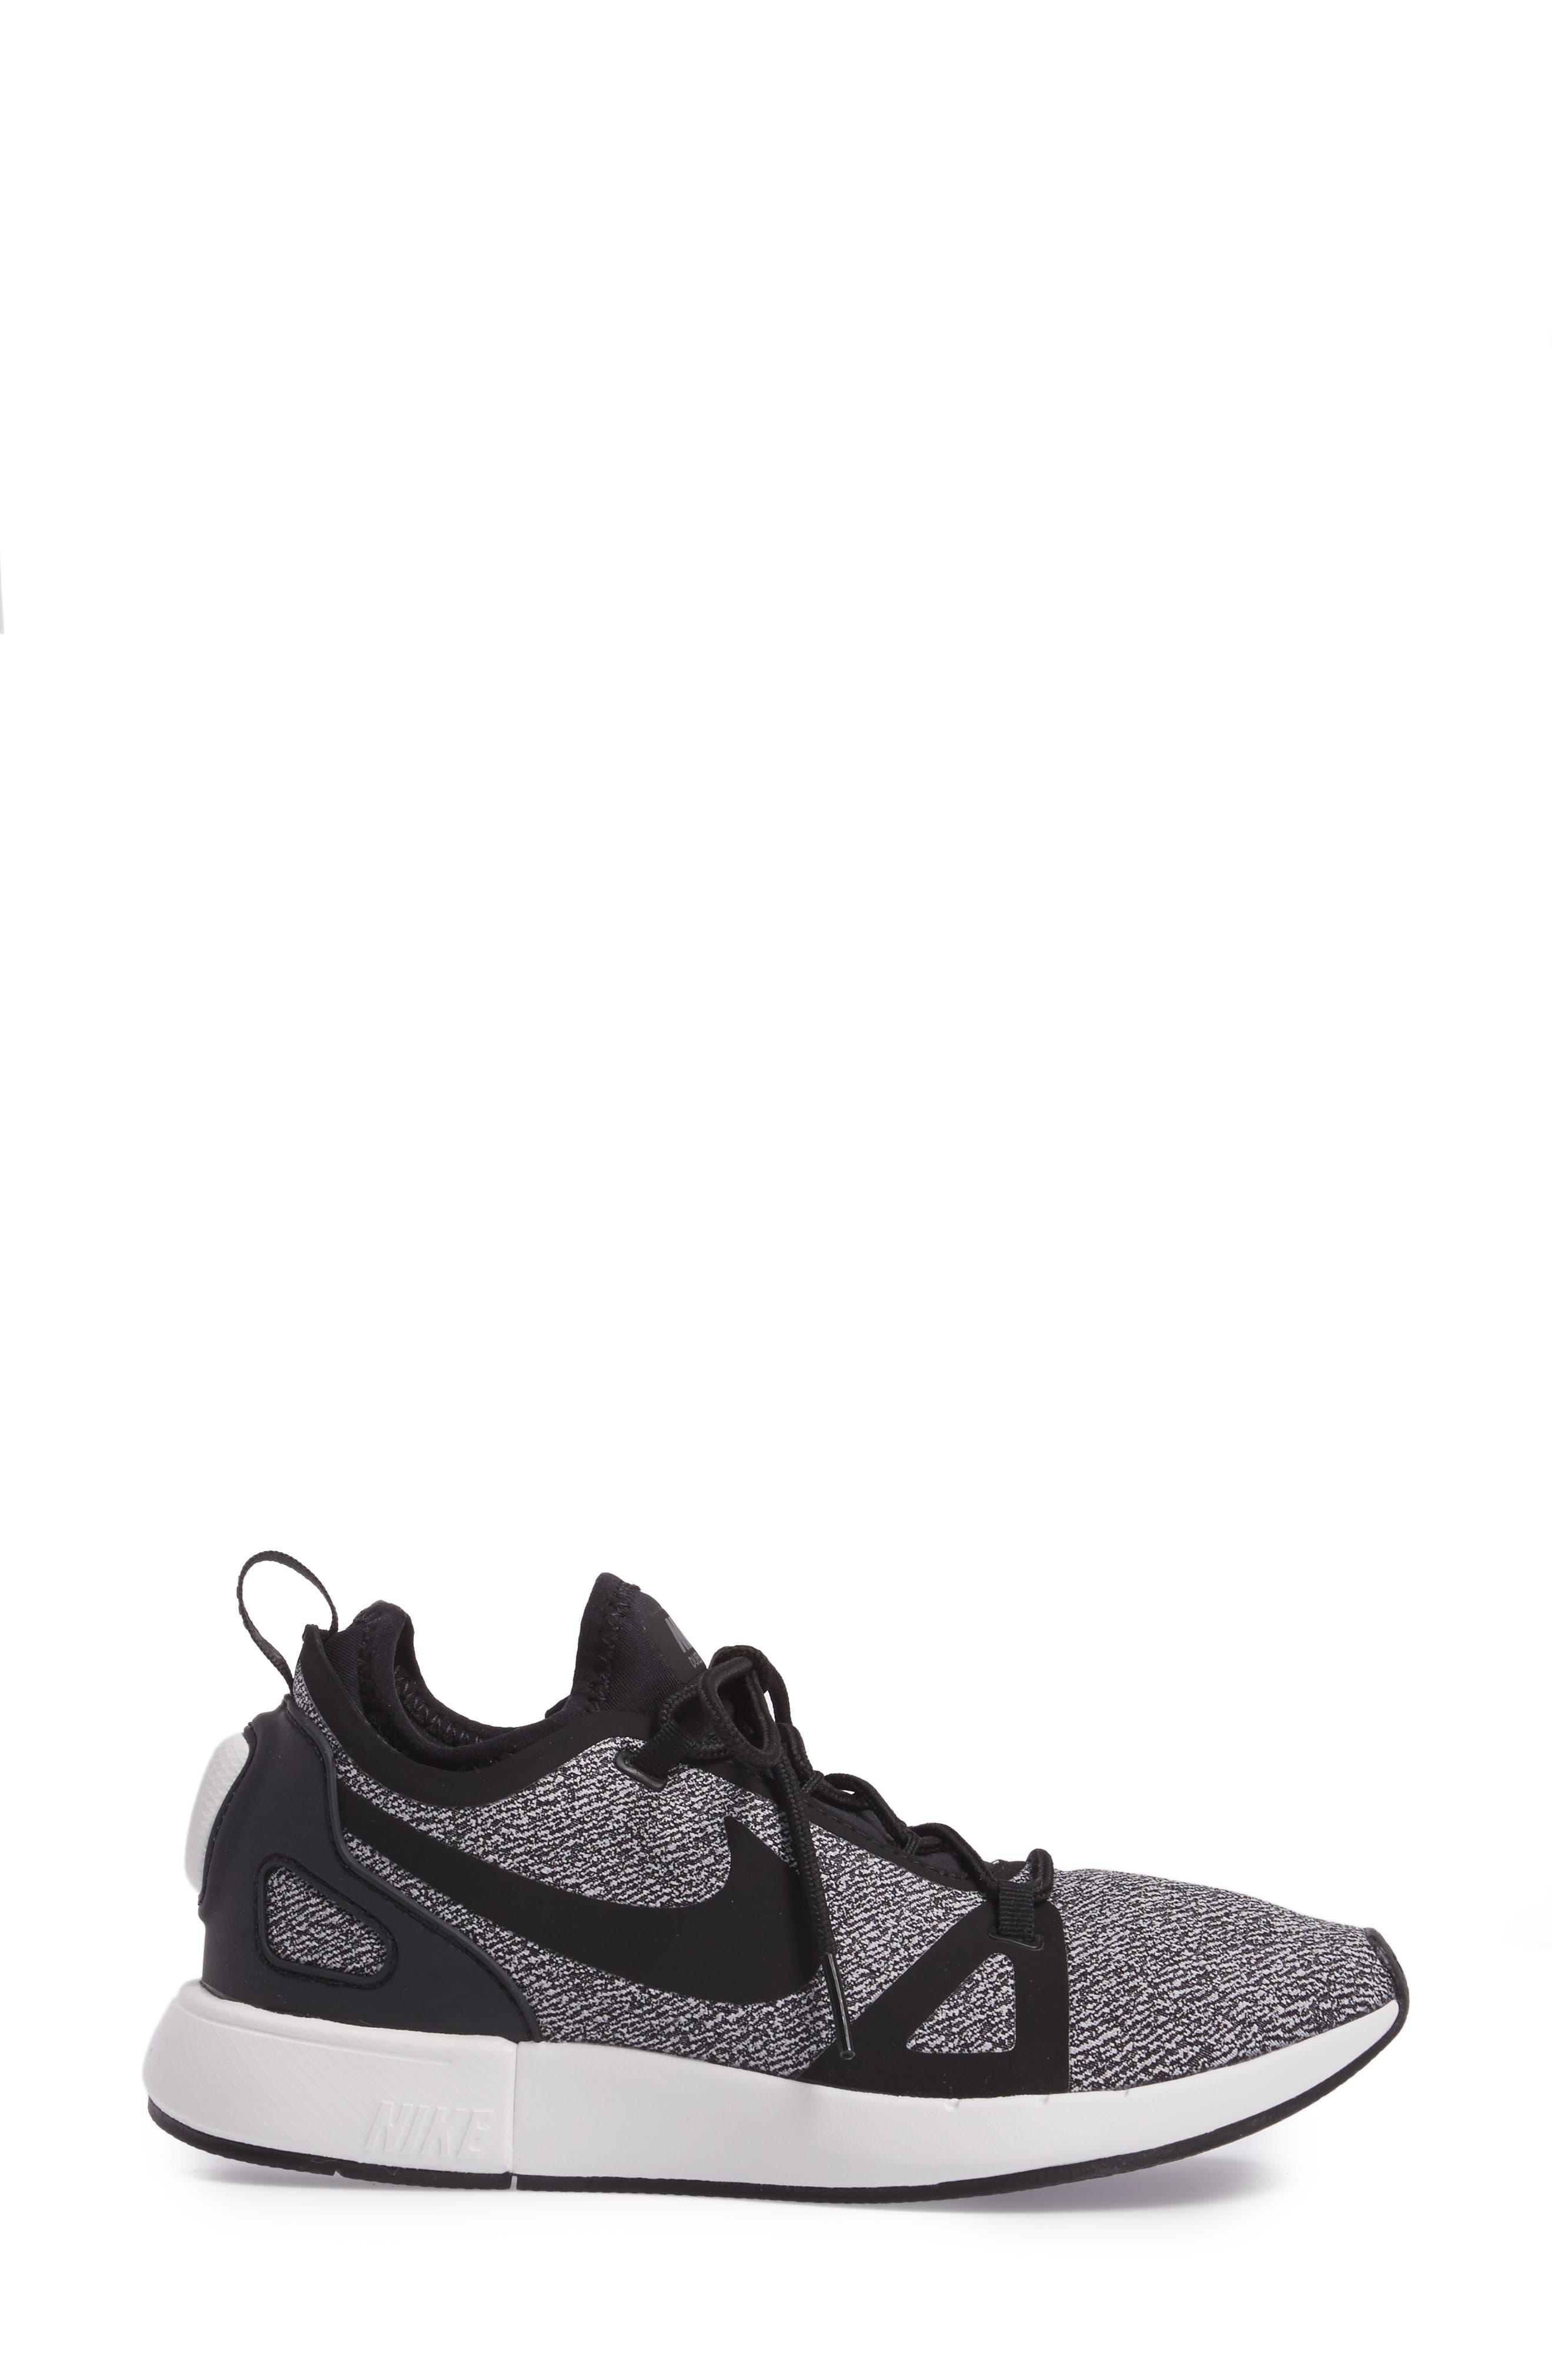 Alternate Image 3  - Nike Duel Racer Knit Sneaker (Women)